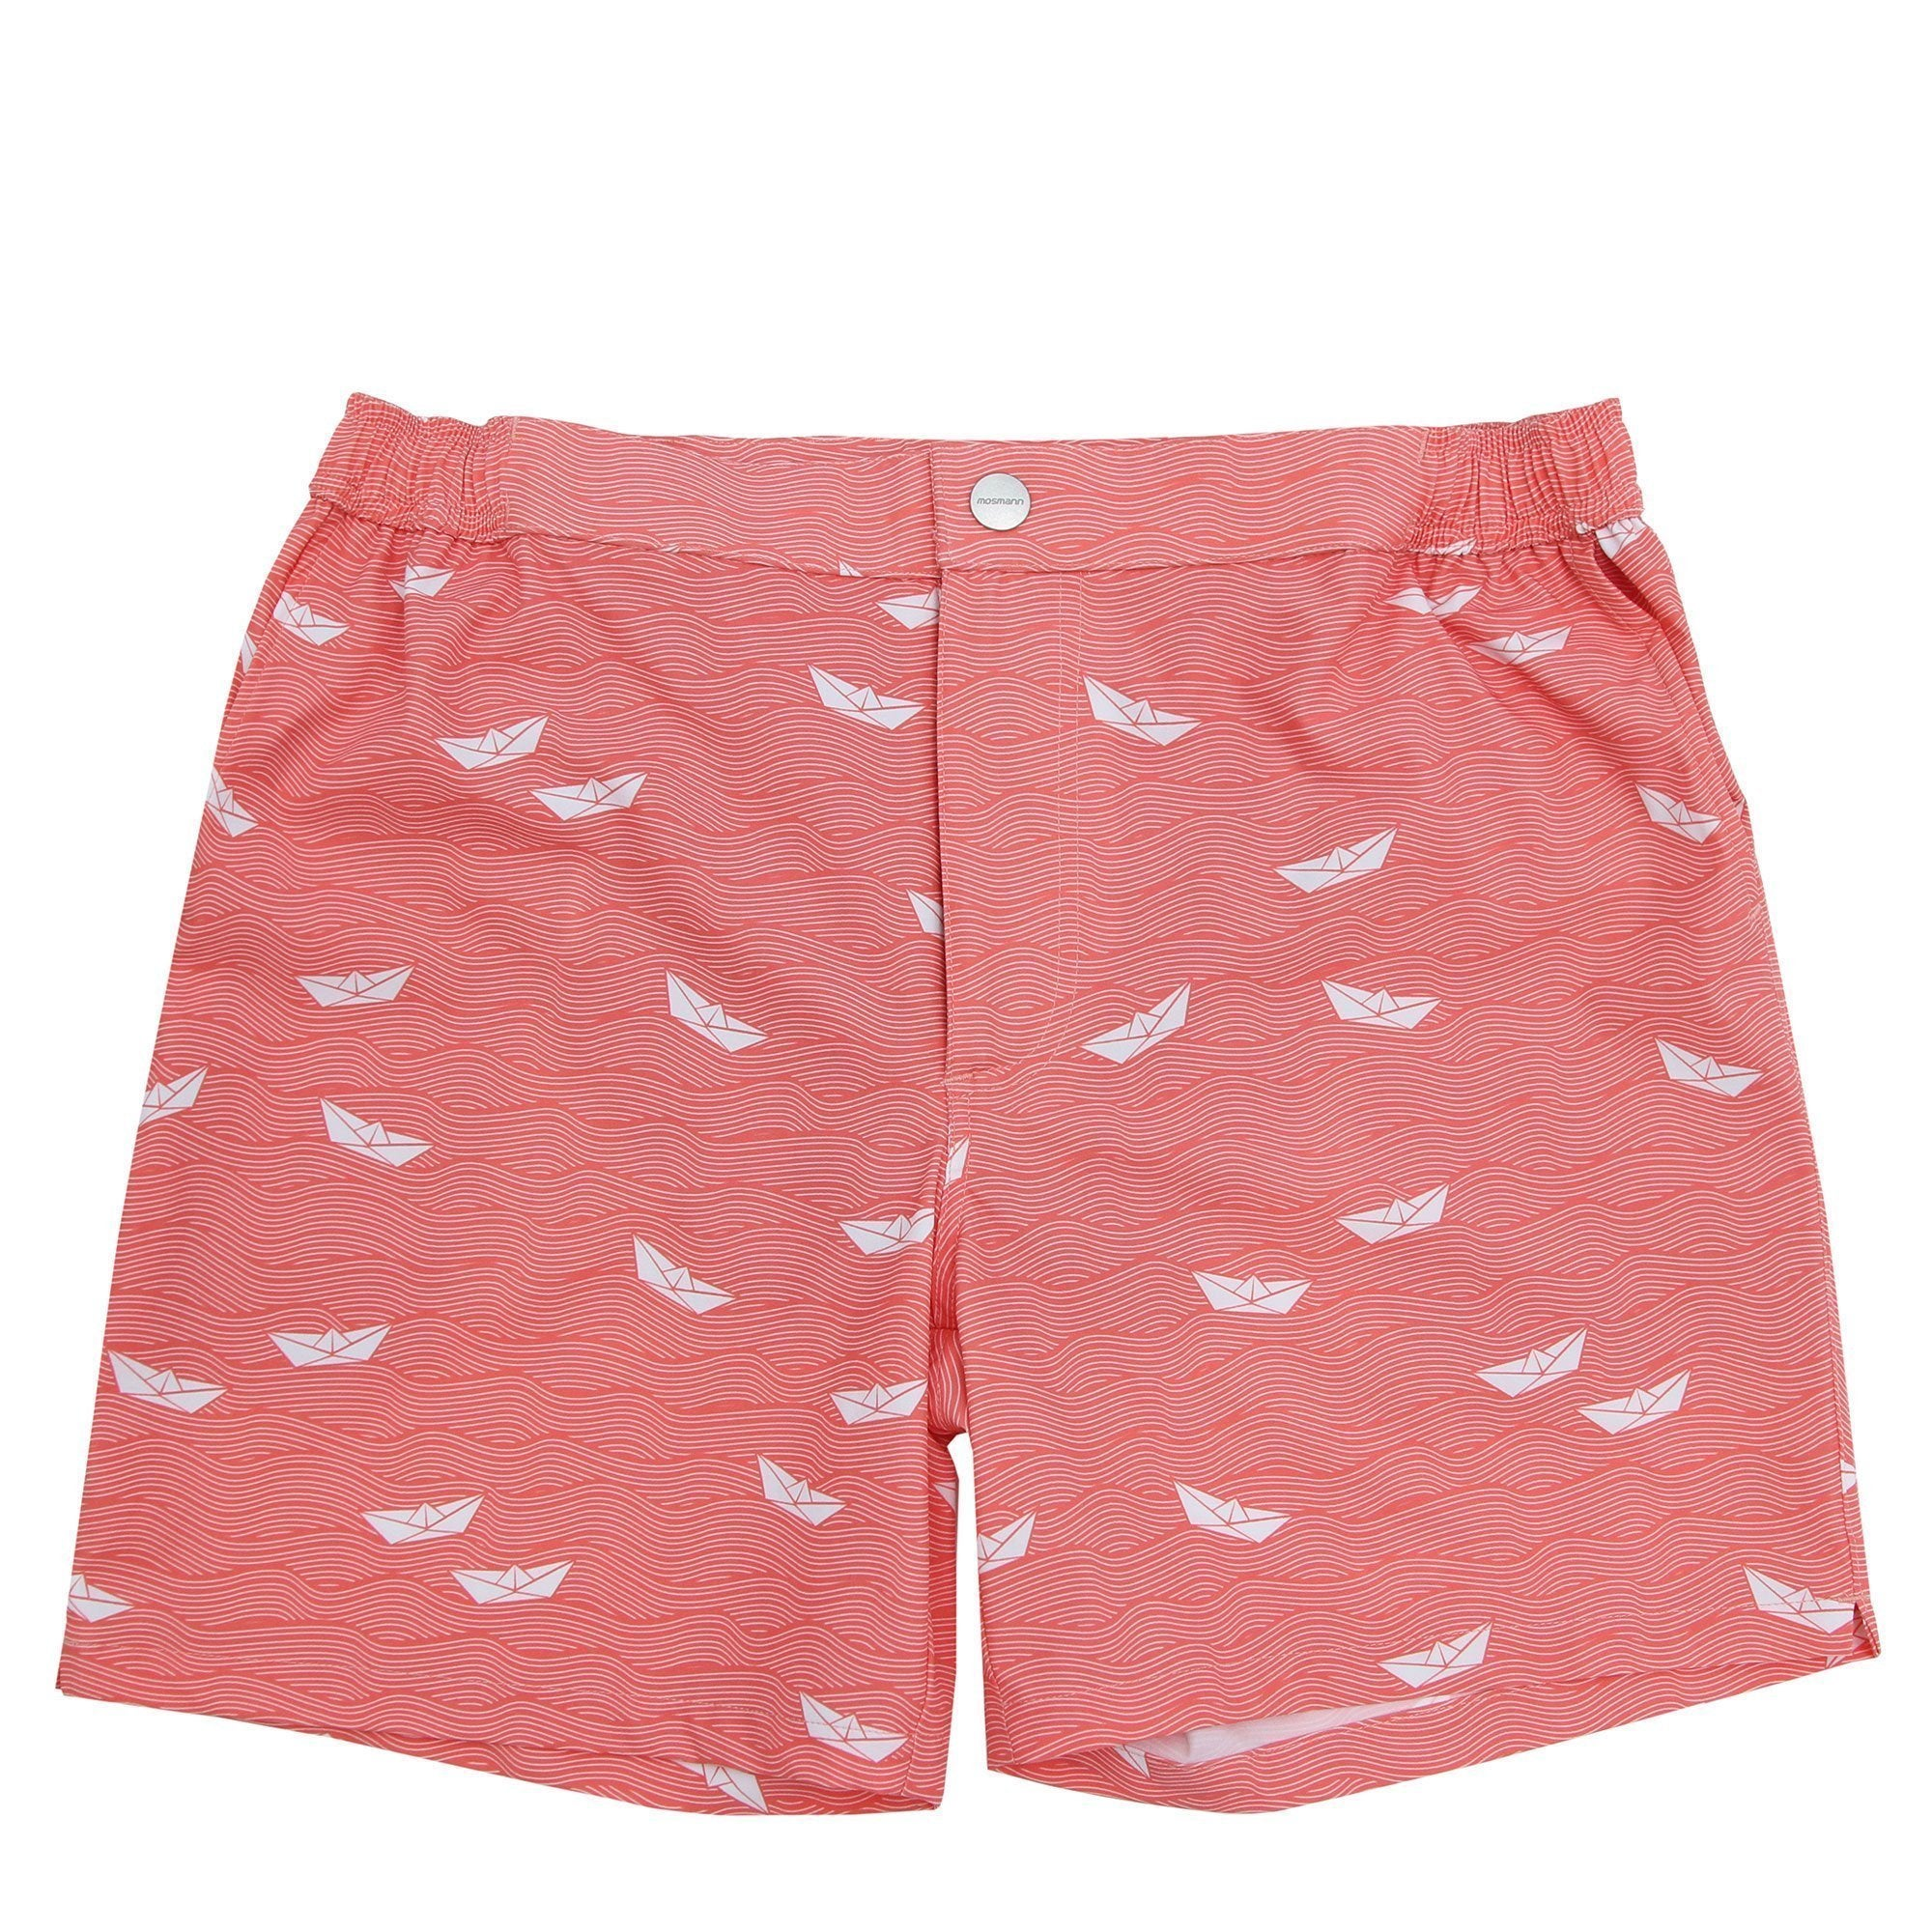 Resort Swim Shorts - Origami